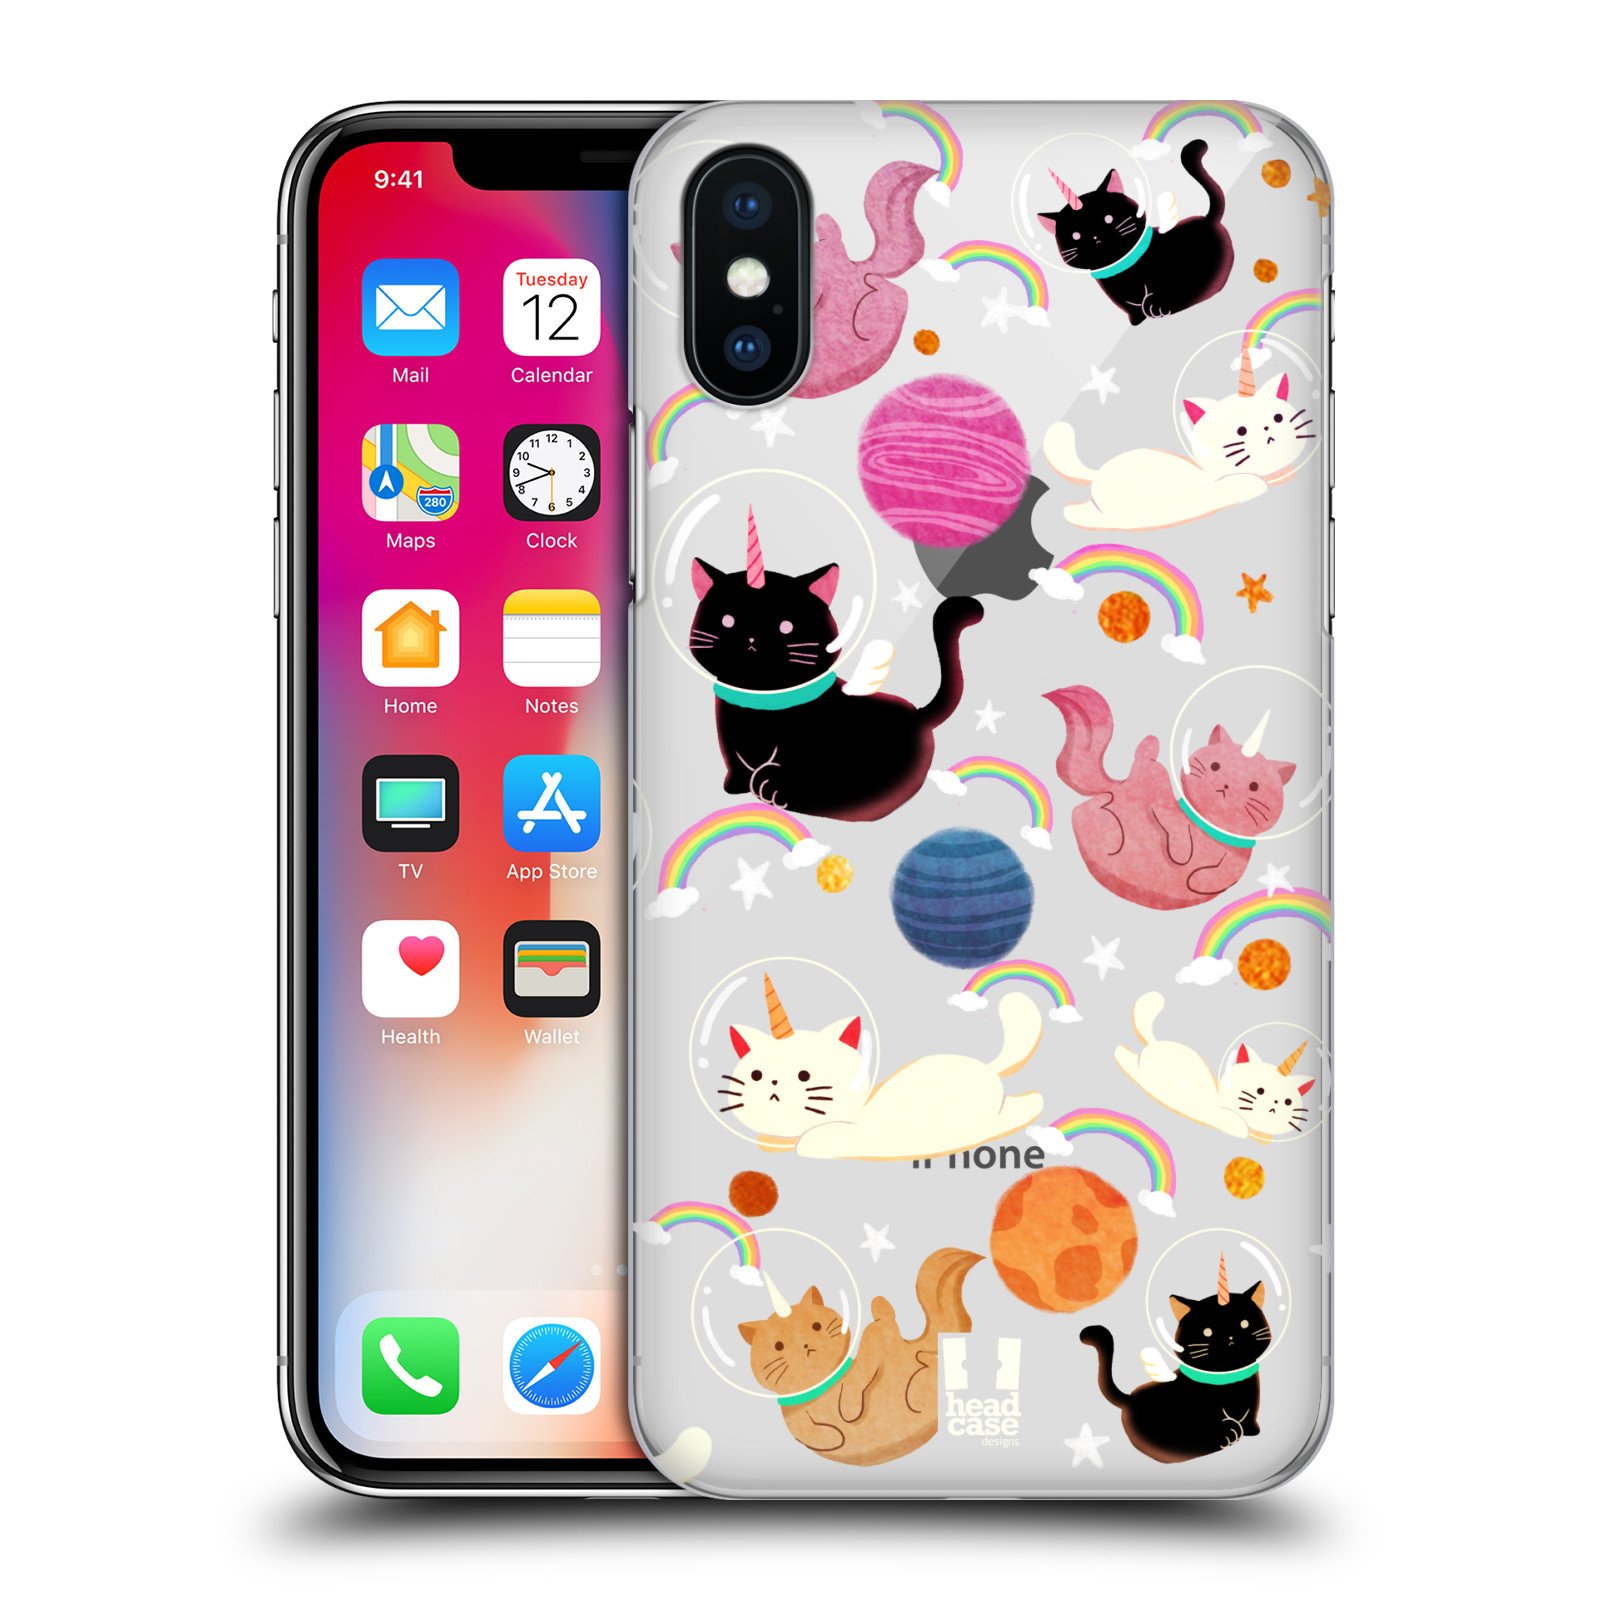 Funda-HEAD-CASE-DESIGNS-DE-espacio-Unicornios-funda-rigida-posterior-para-telefonos-Apple-iPhone